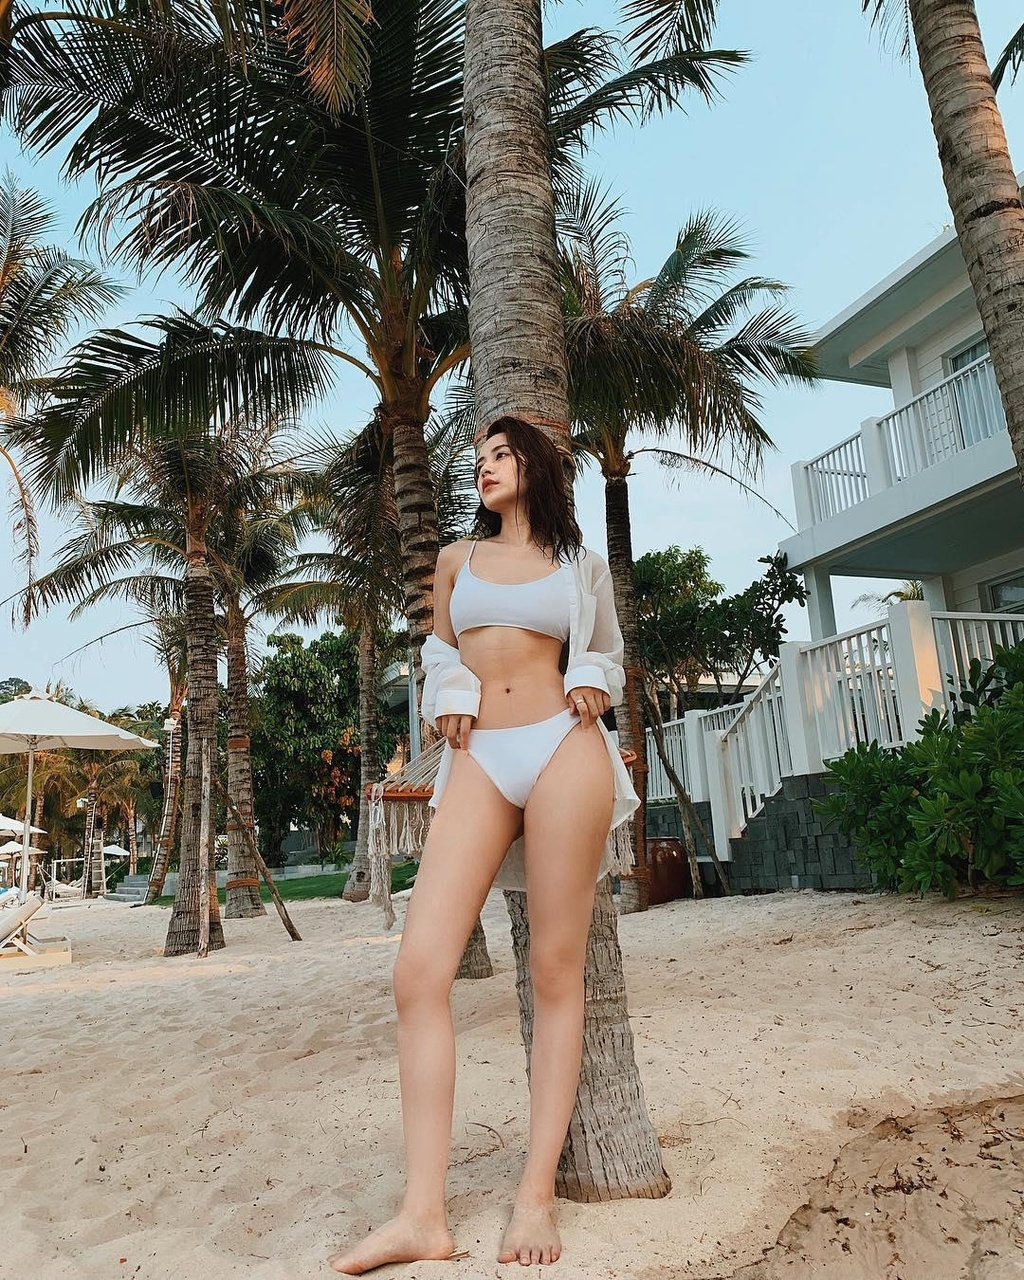 Hoc Jun Vu, Chi Pu cach tao dang voi bikini khi di du lich bien hinh anh 8